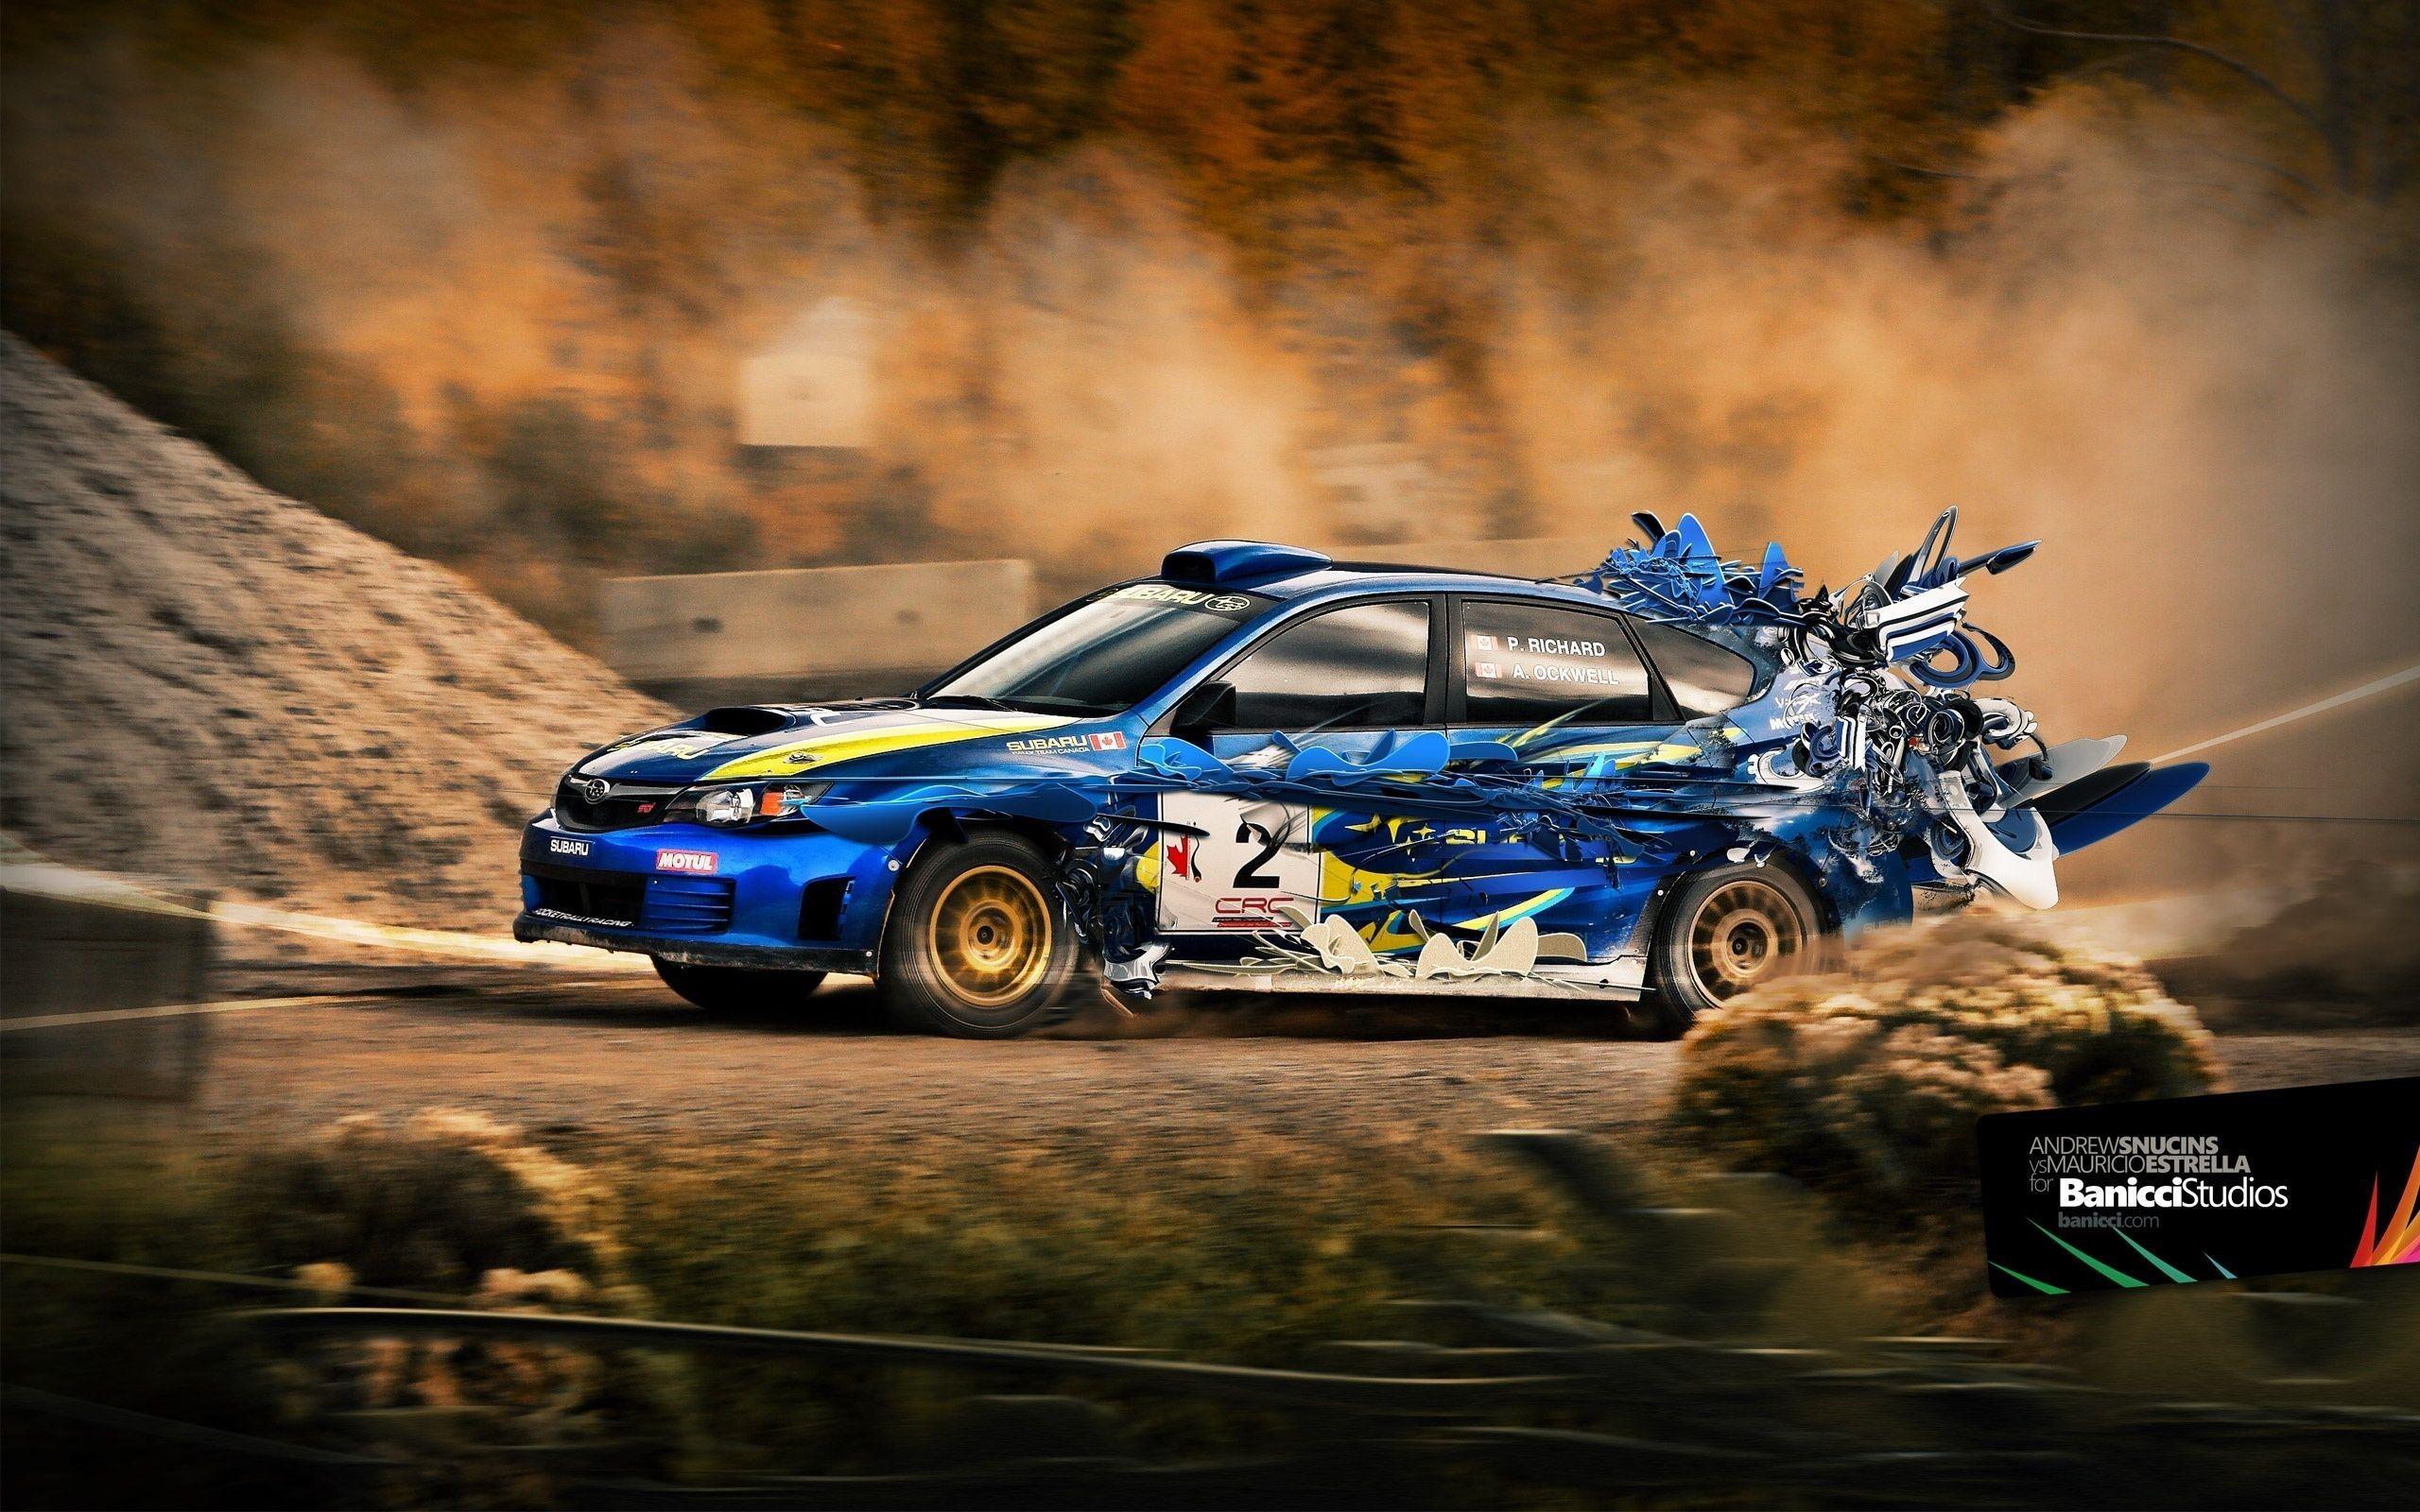 Subaru Rally Car HTC Wallpapers